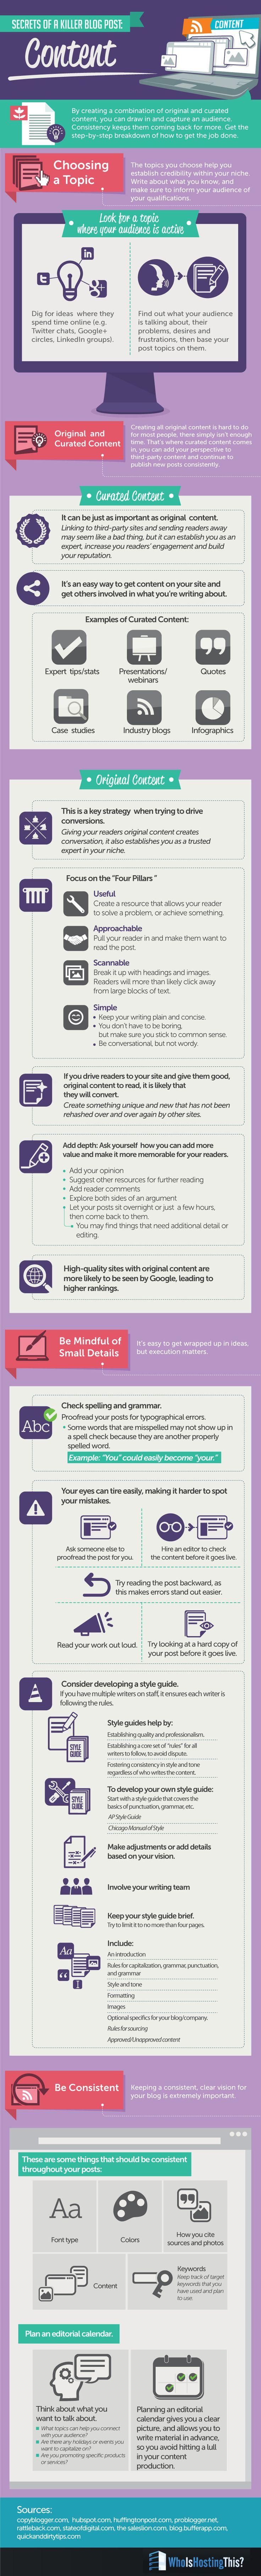 Secrets of a Killer Blog Post www.socialmediamamma.com Blogging Infographic - Social Media Marketing